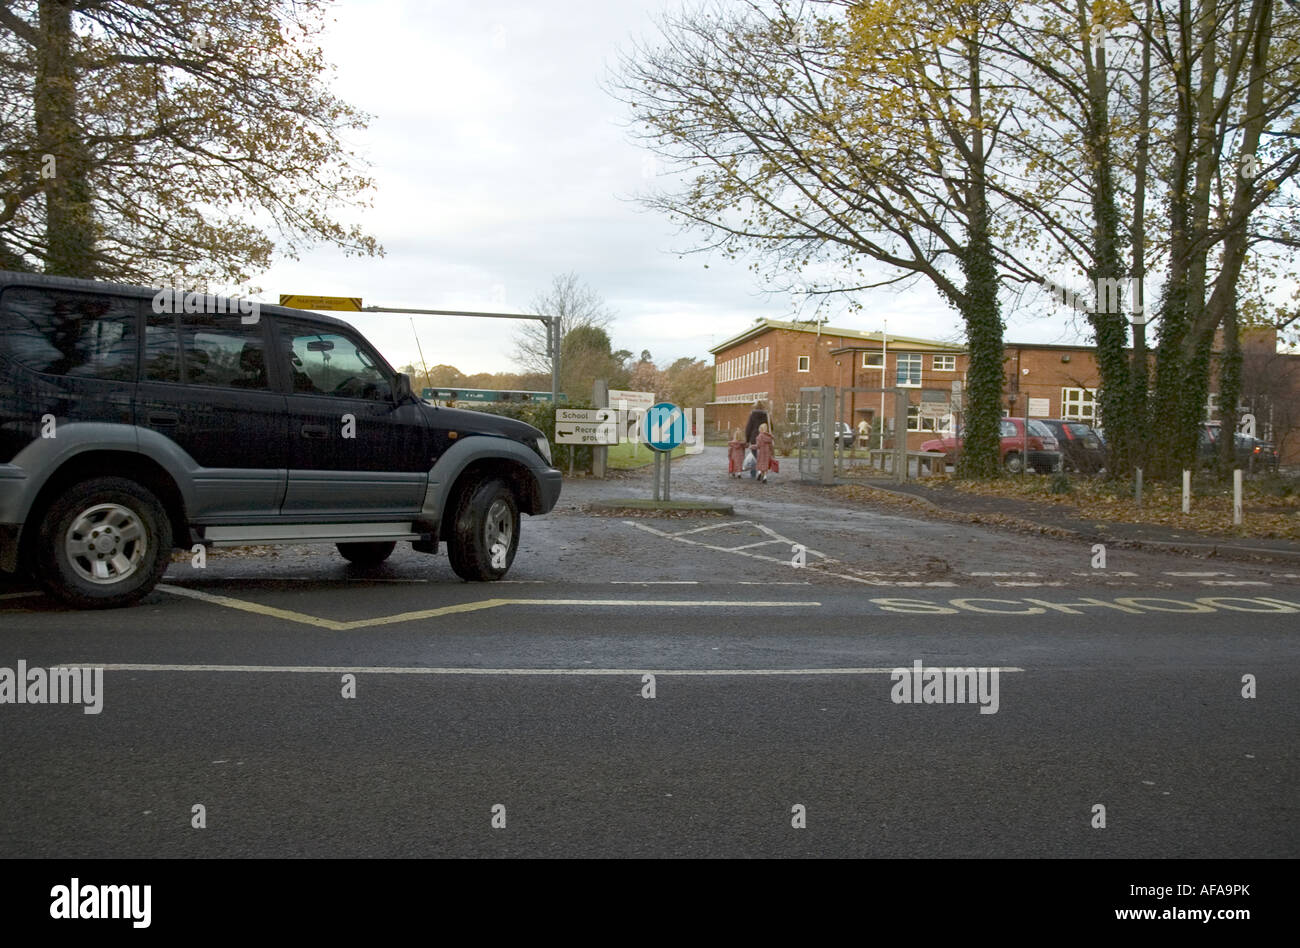 Large 4x4 Car Doing the School Run - Stock Image